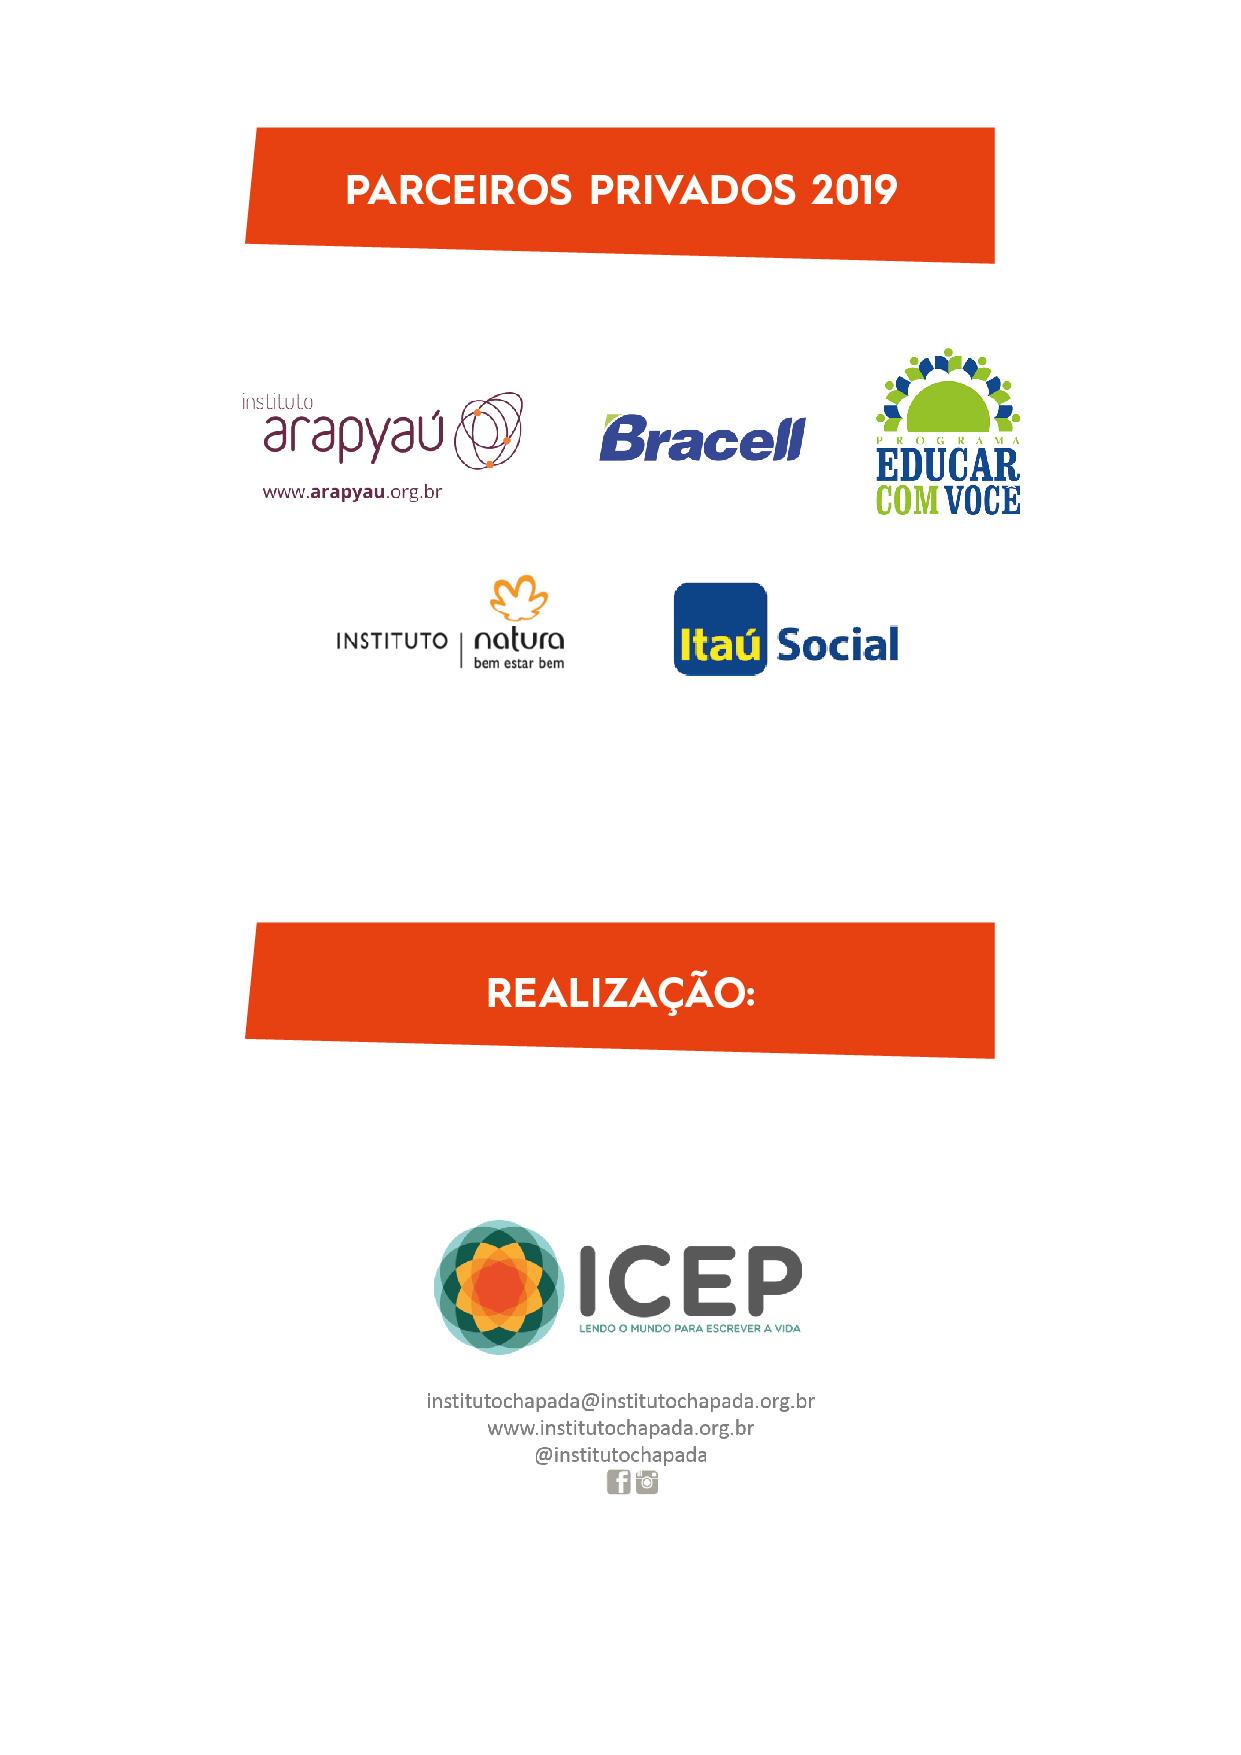 ICEP - Boletim edição 2, versão impressa_Fundo copy 20